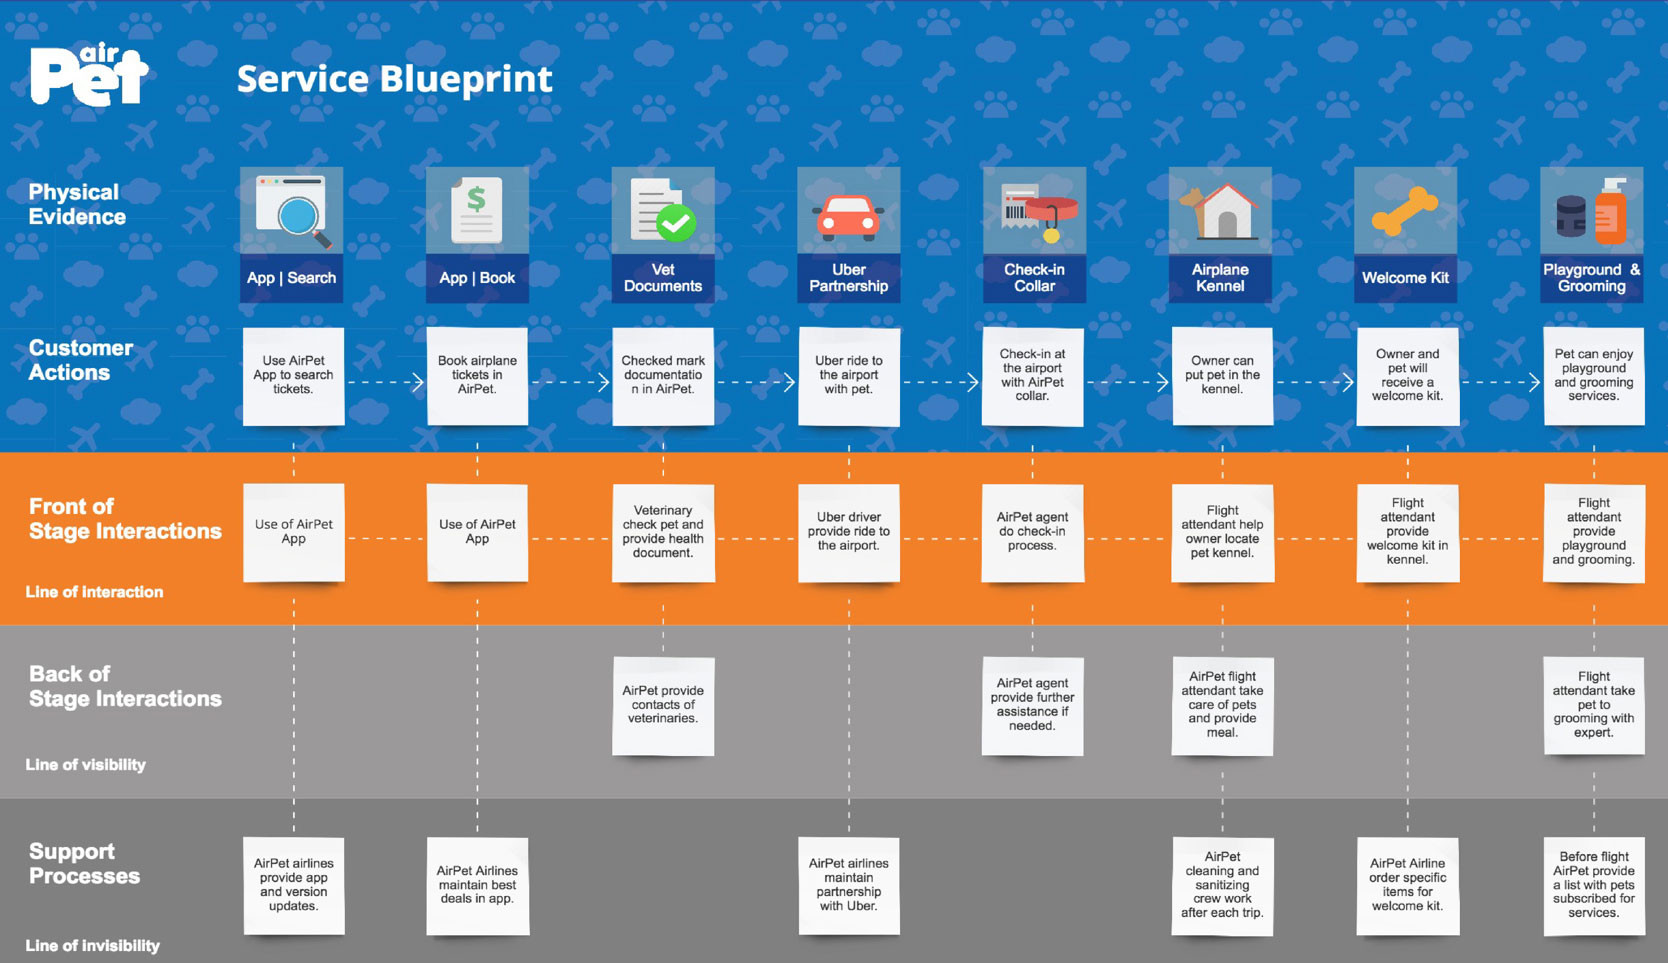 ServiceBlueprint.jpg